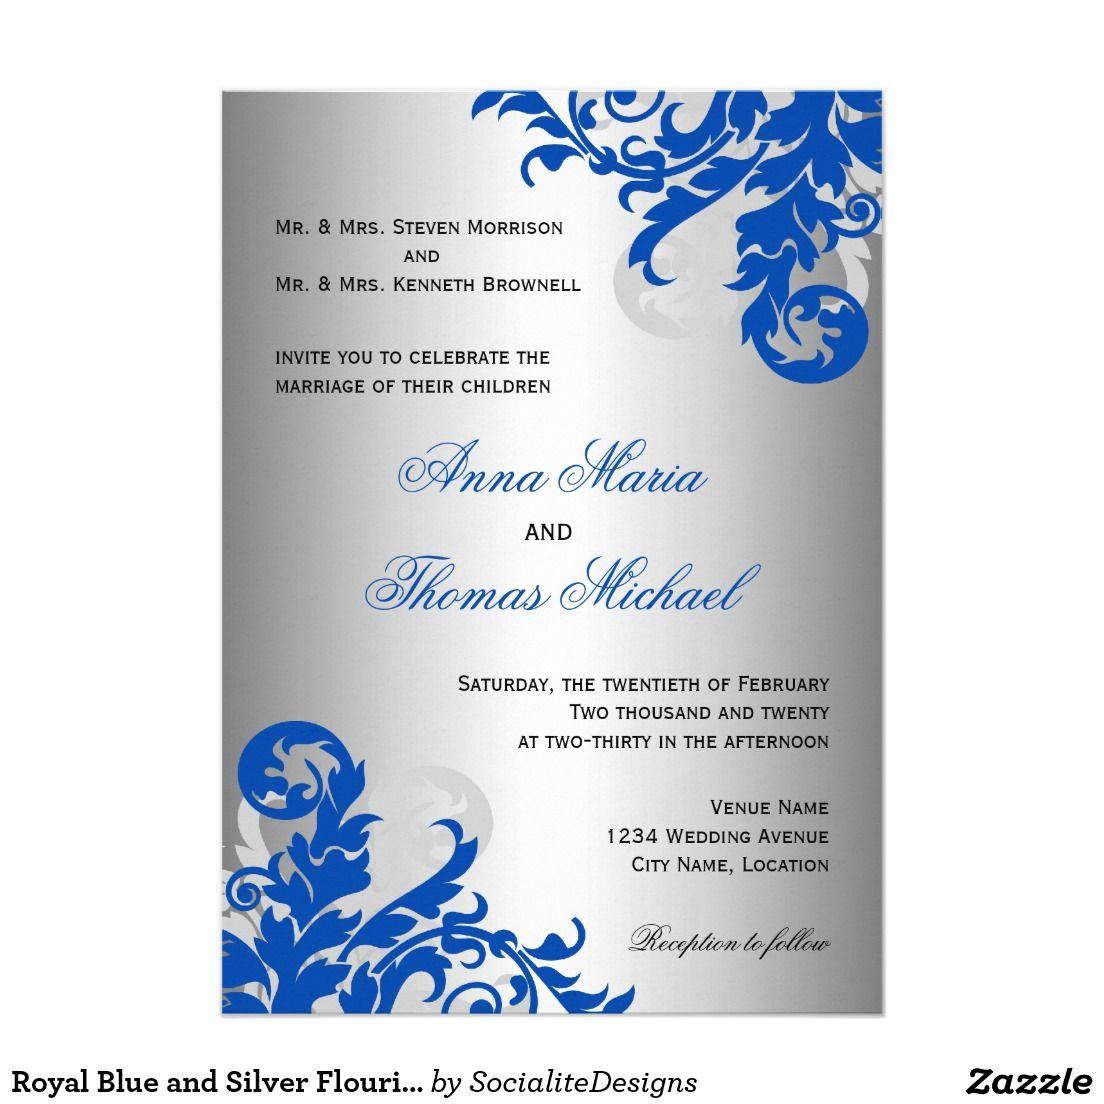 Royal Blue And Silver Flourish Wedding Invitation Zazzle Com Royal Blue Wedding Invitations Silver Wedding Invitations Royal Blue Wedding Theme